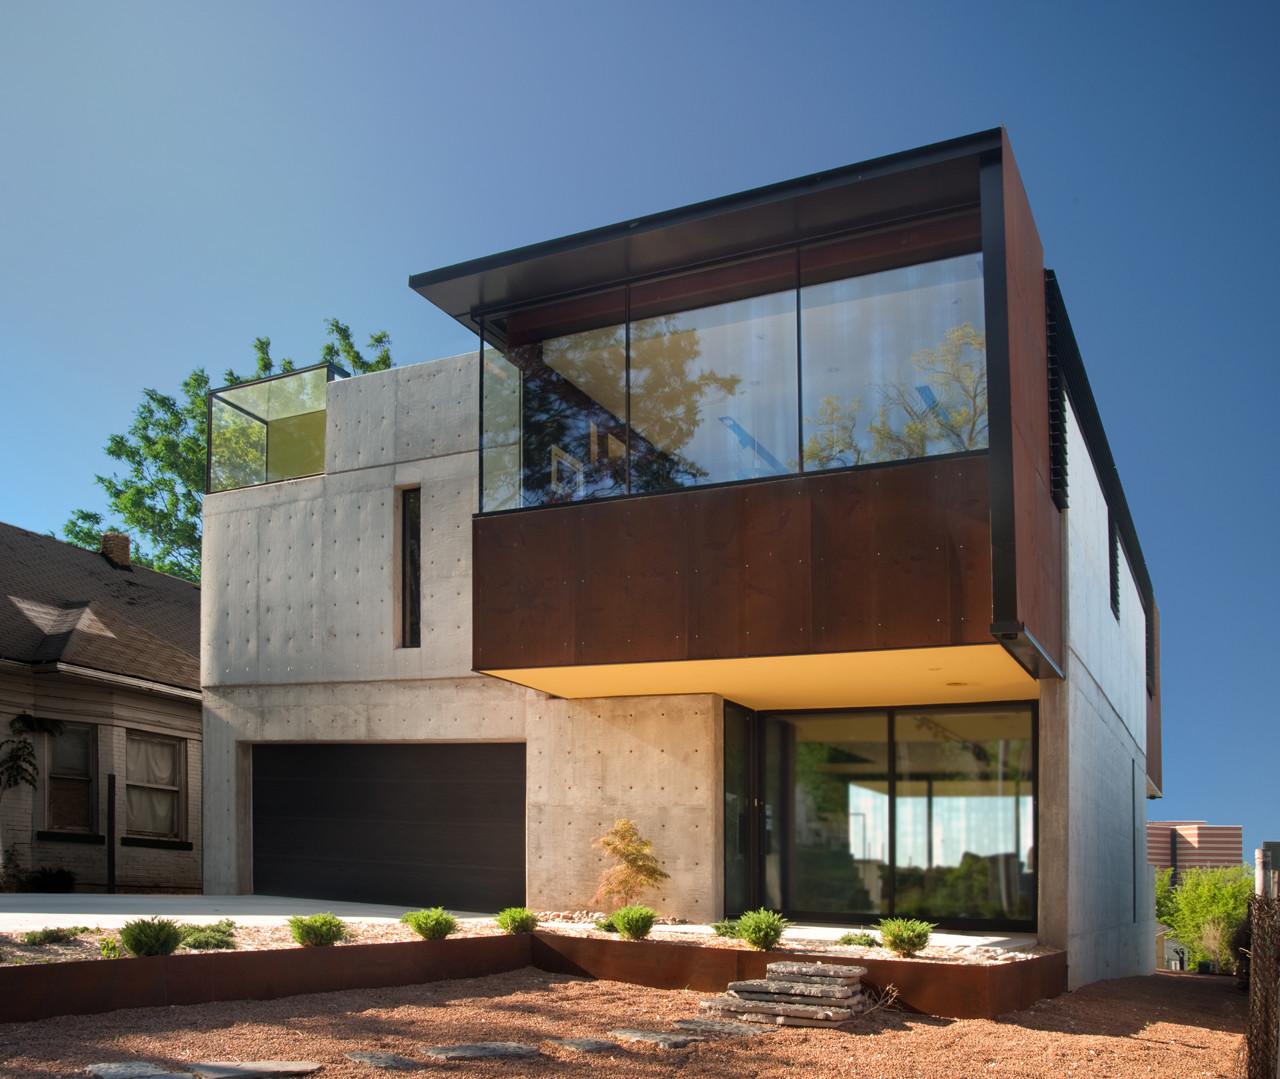 Gallery of oklahoma case study house fitzsimmons for Casas arquitectonicas modernas